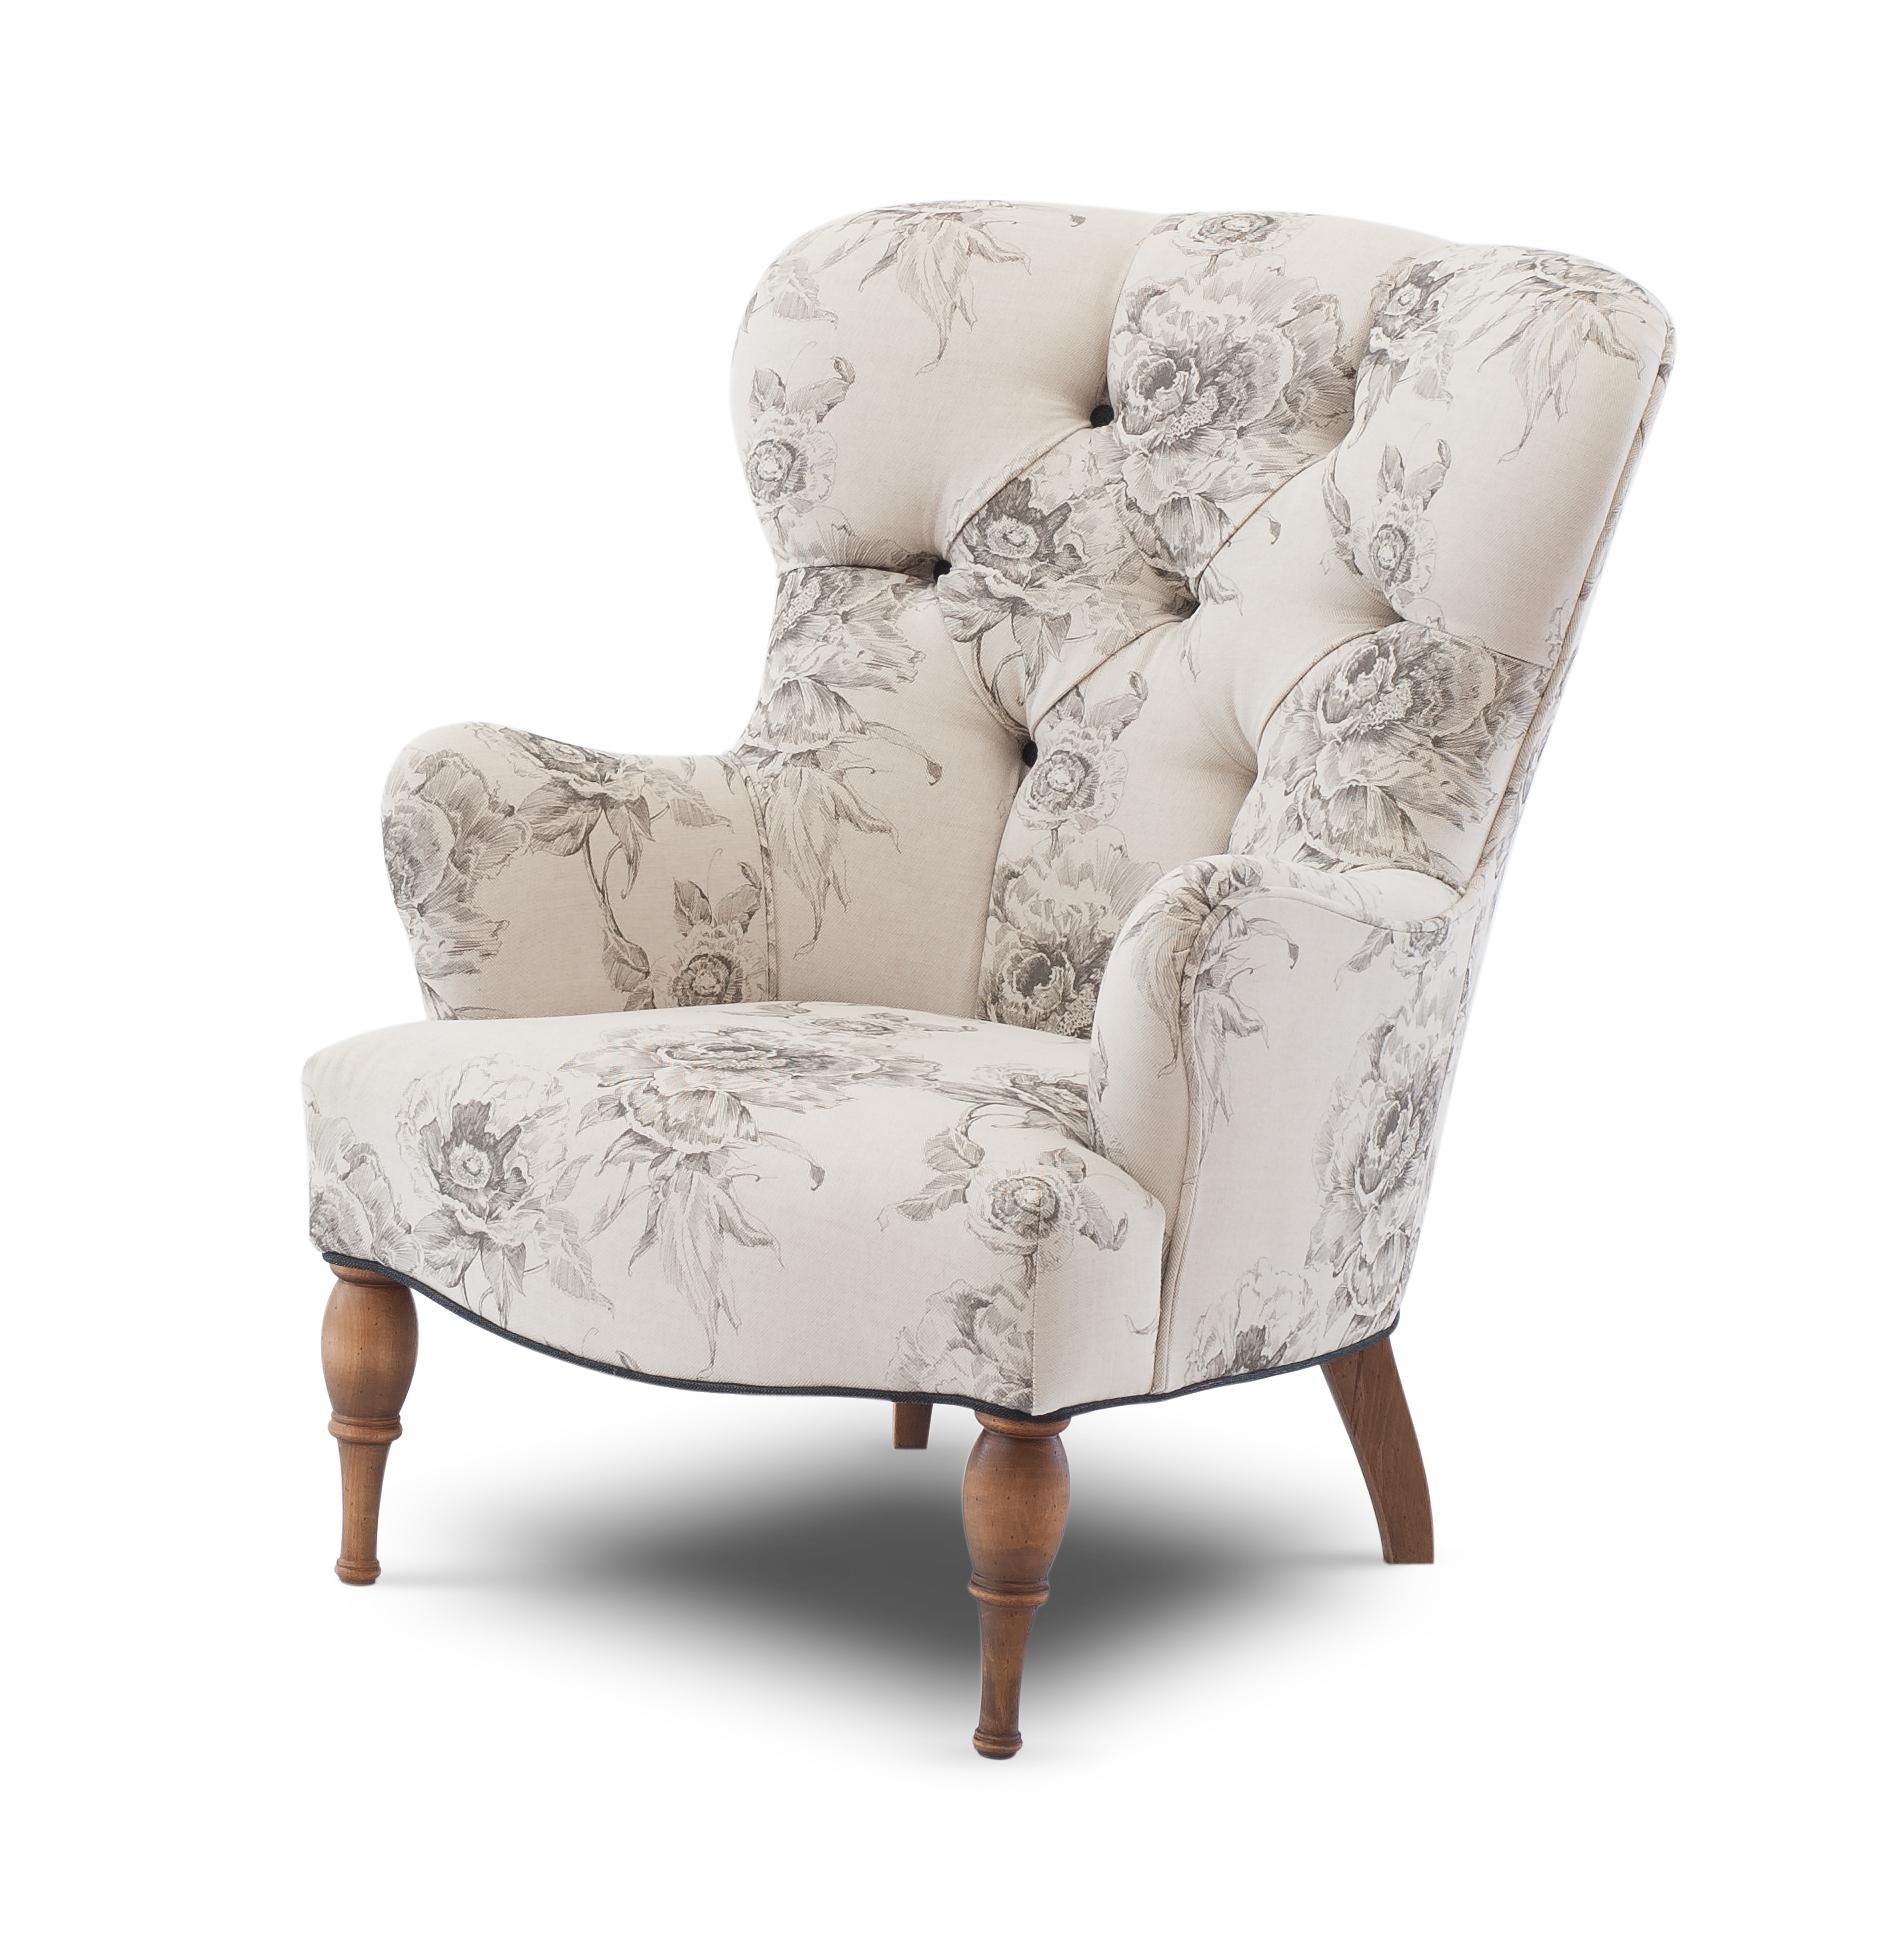 Woodland Chair-113.jpg